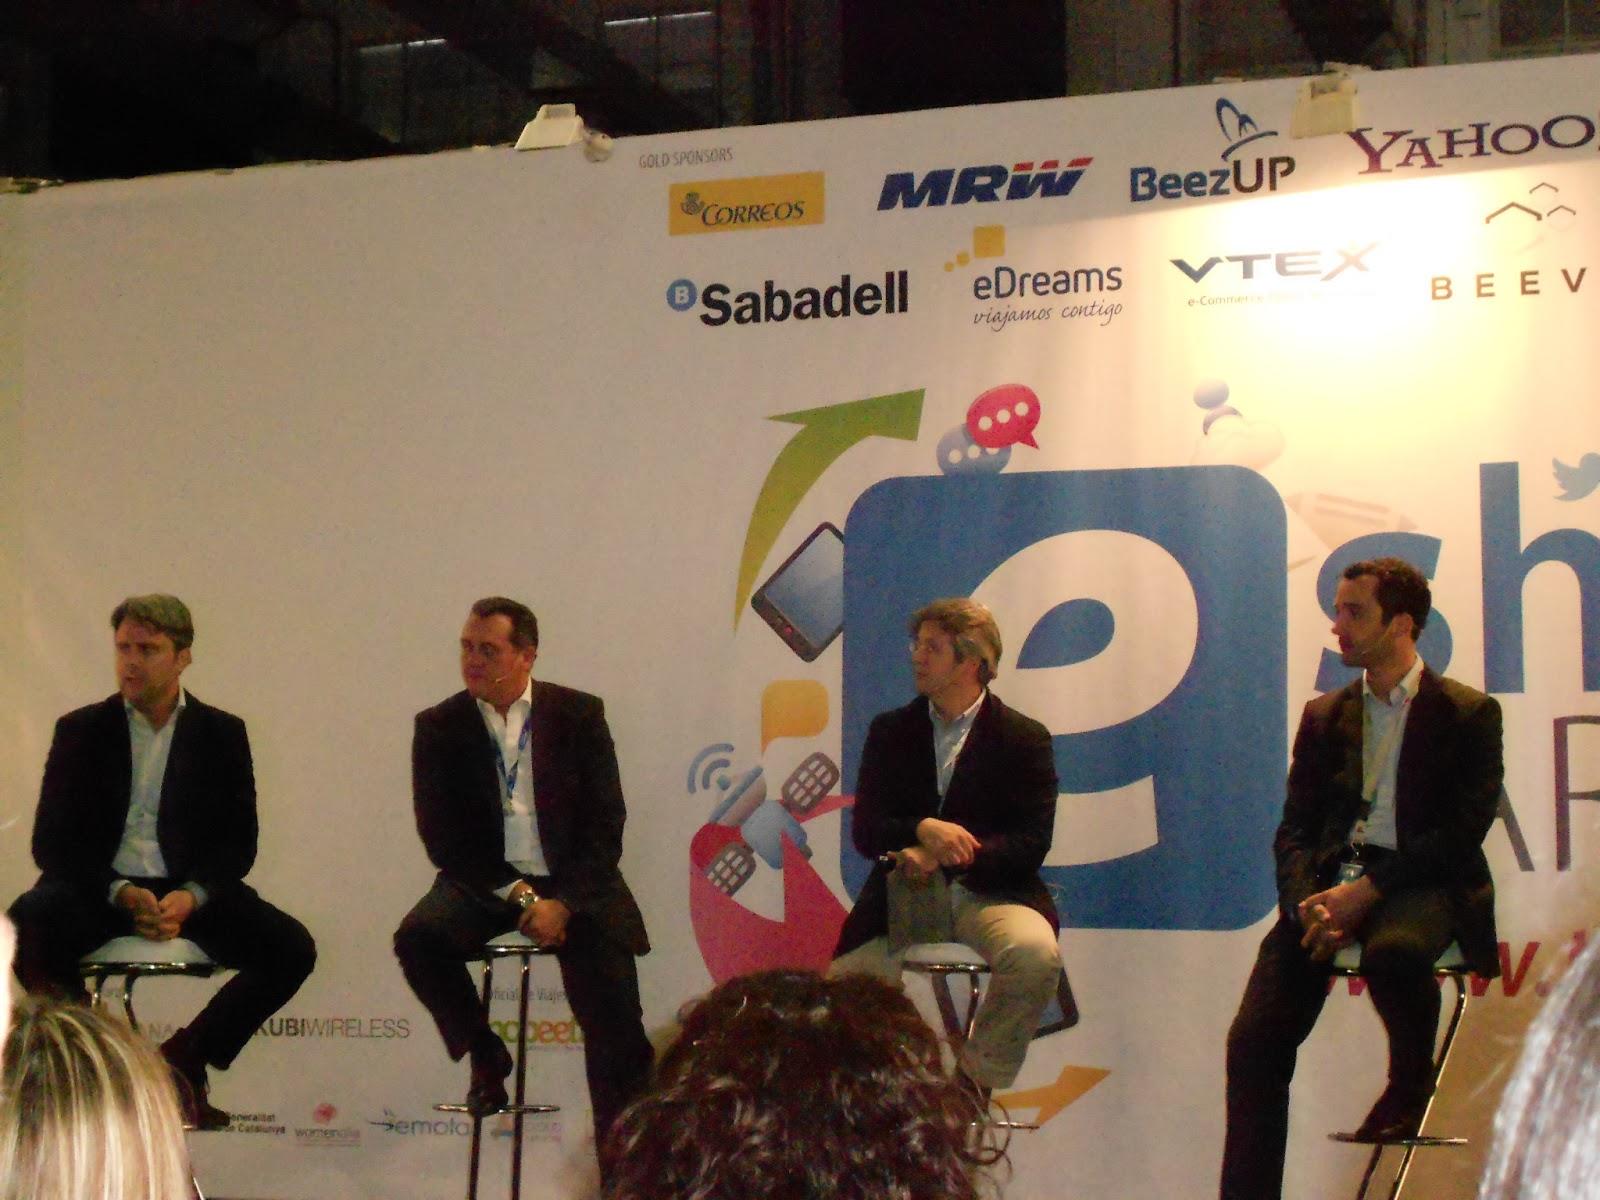 Imagen Foro de Marketing Online eShow Barcelona 2013 - De izquierda a derecha: Henri-Noel Bouvet, Alfredo Vázquez, Jorge González y Jean Baptiste Boubault